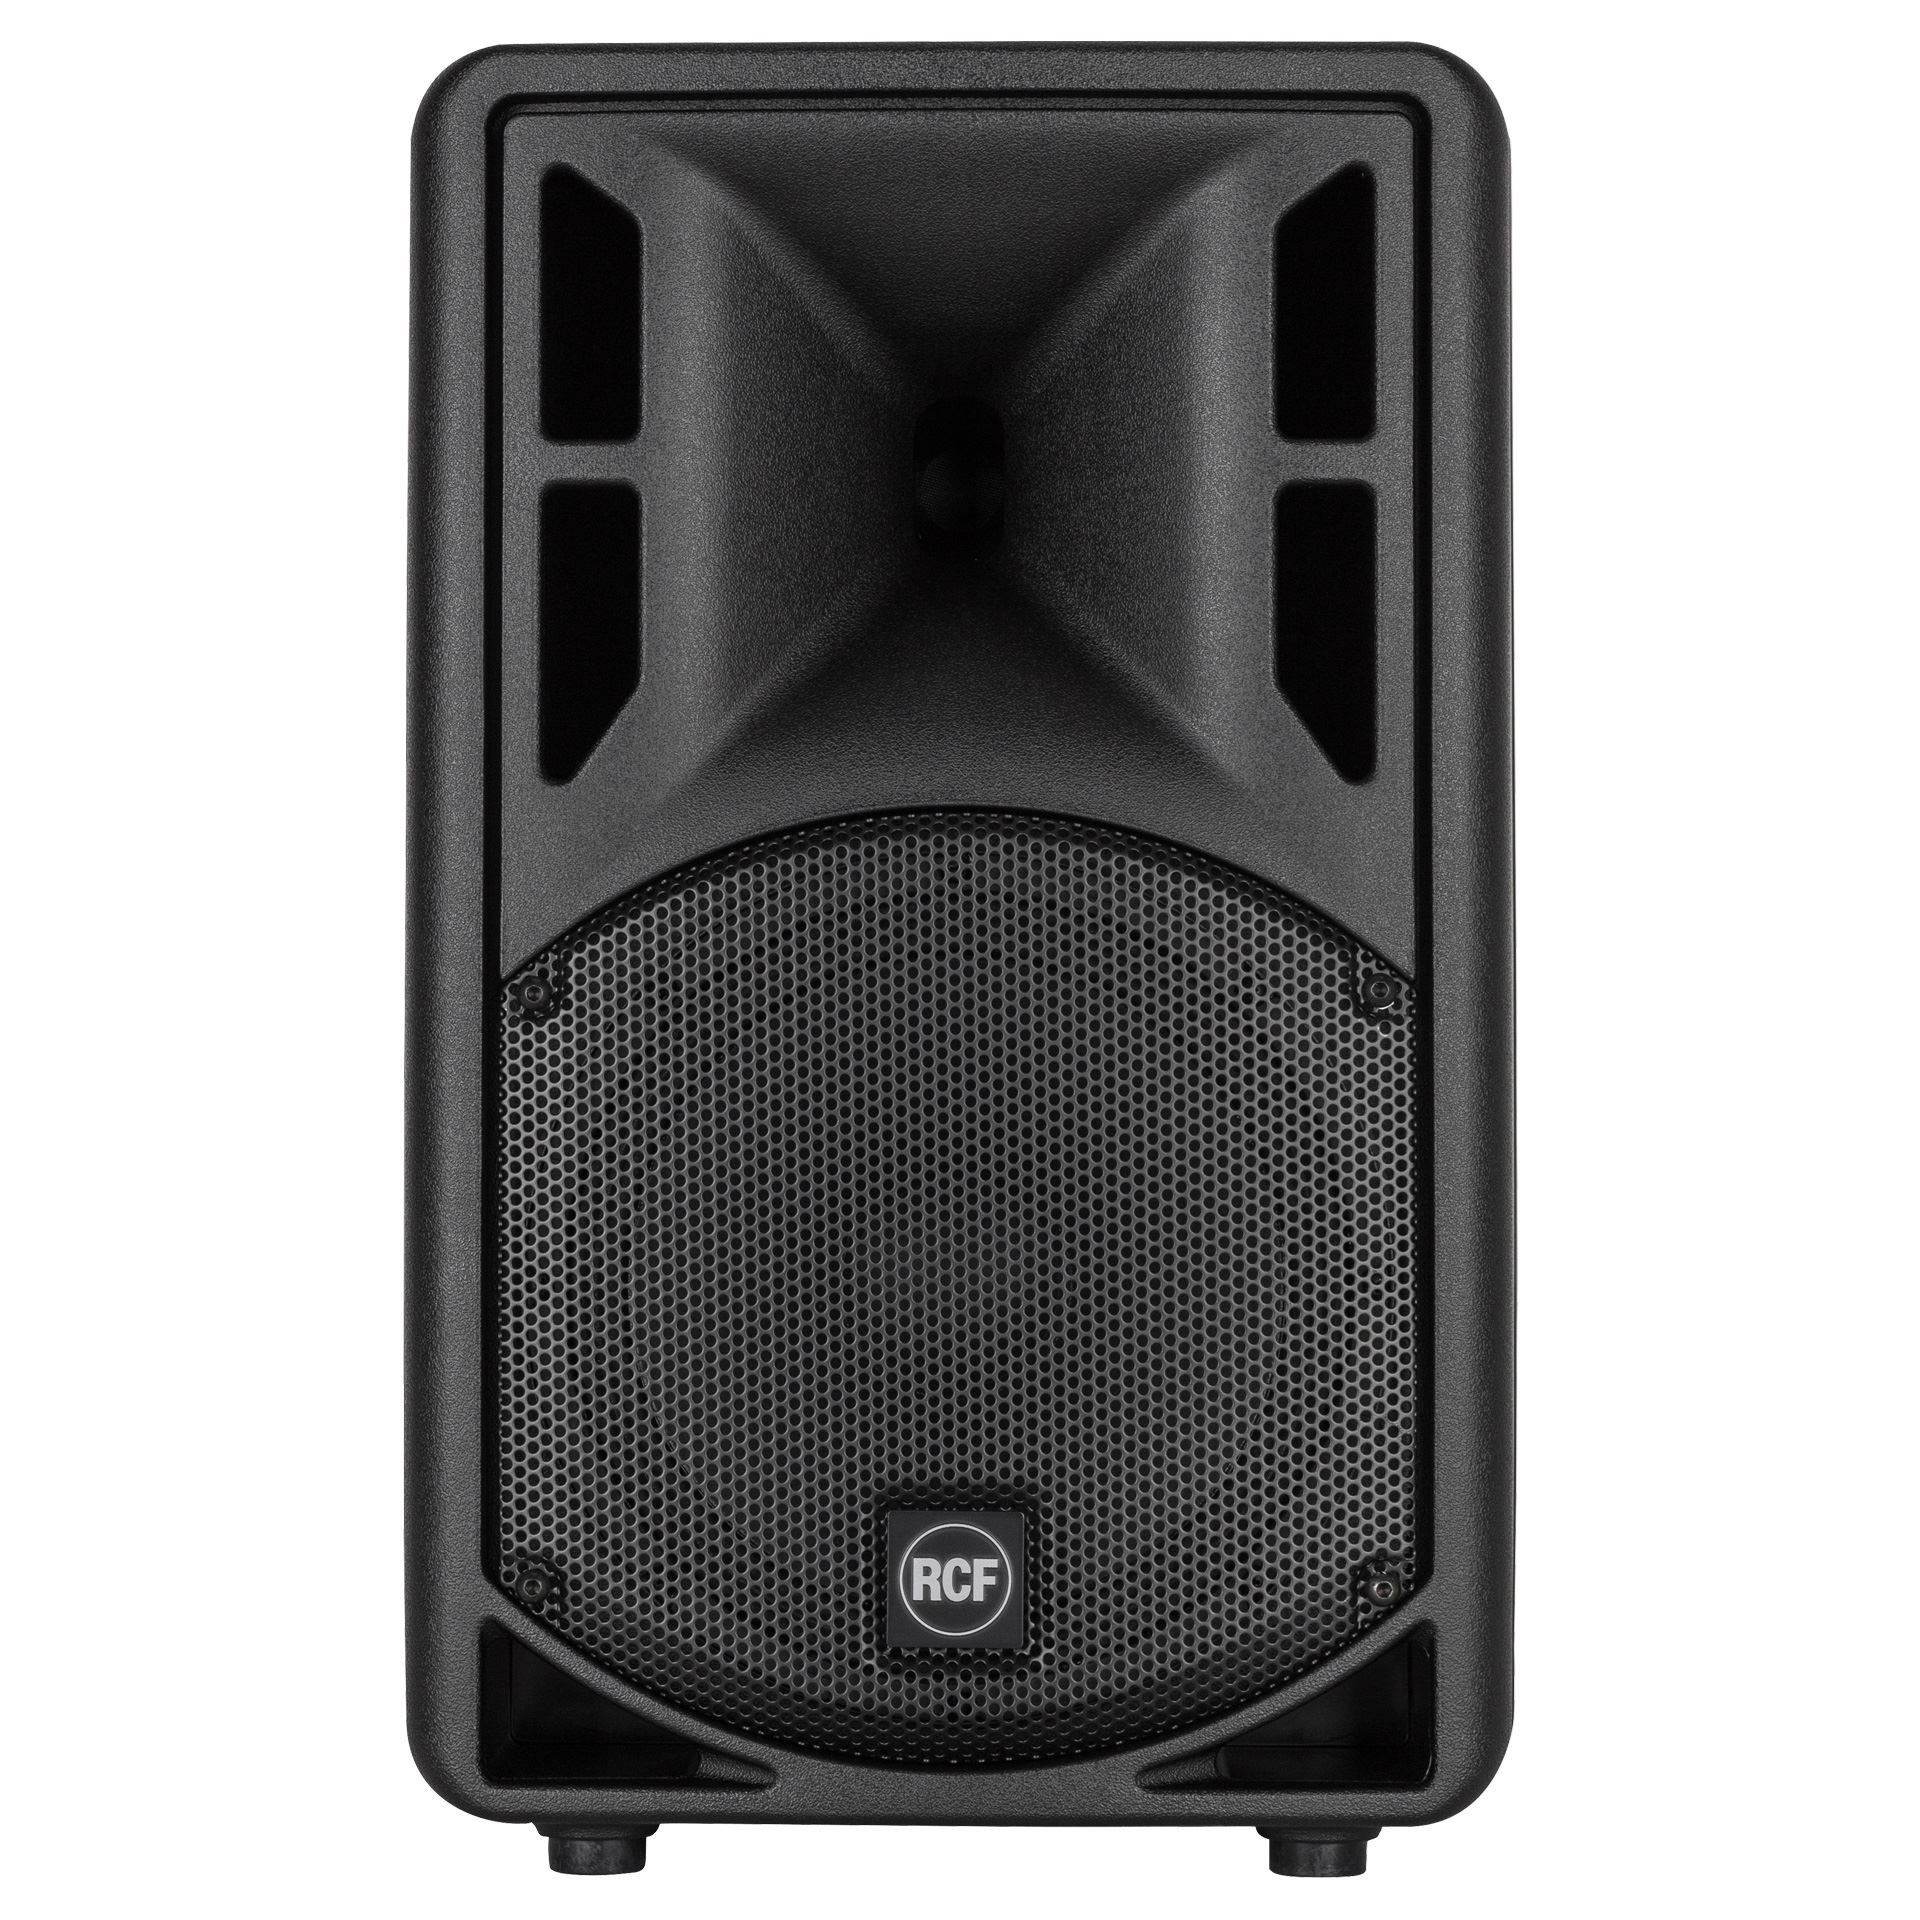 RCF ART 310A MK4 10 Inch Powered PA Speaker (ART310AMK4)